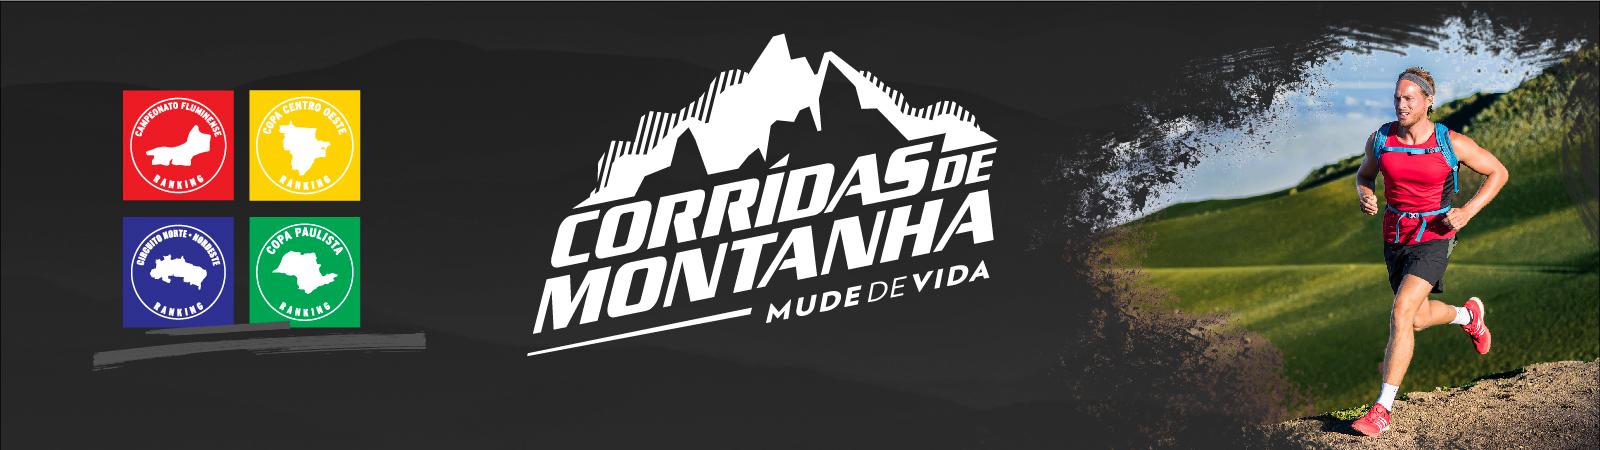 Combo Corridas de Montanha - Imagem de topo